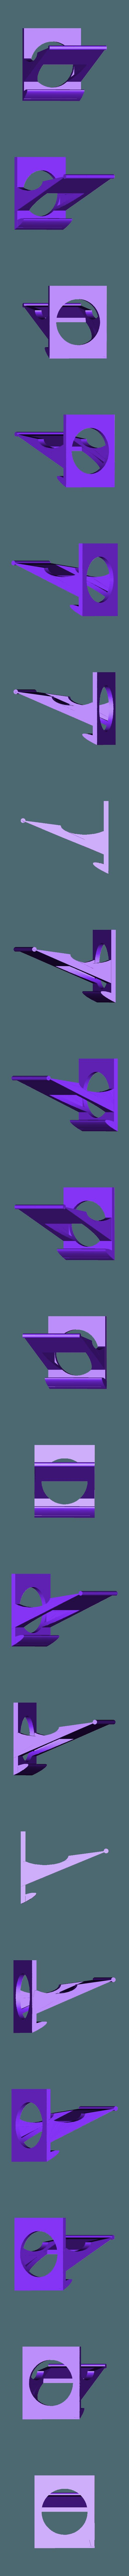 universele_smartphone_houder.stl Download free STL file Univers smartphone holder • Object to 3D print, Joep